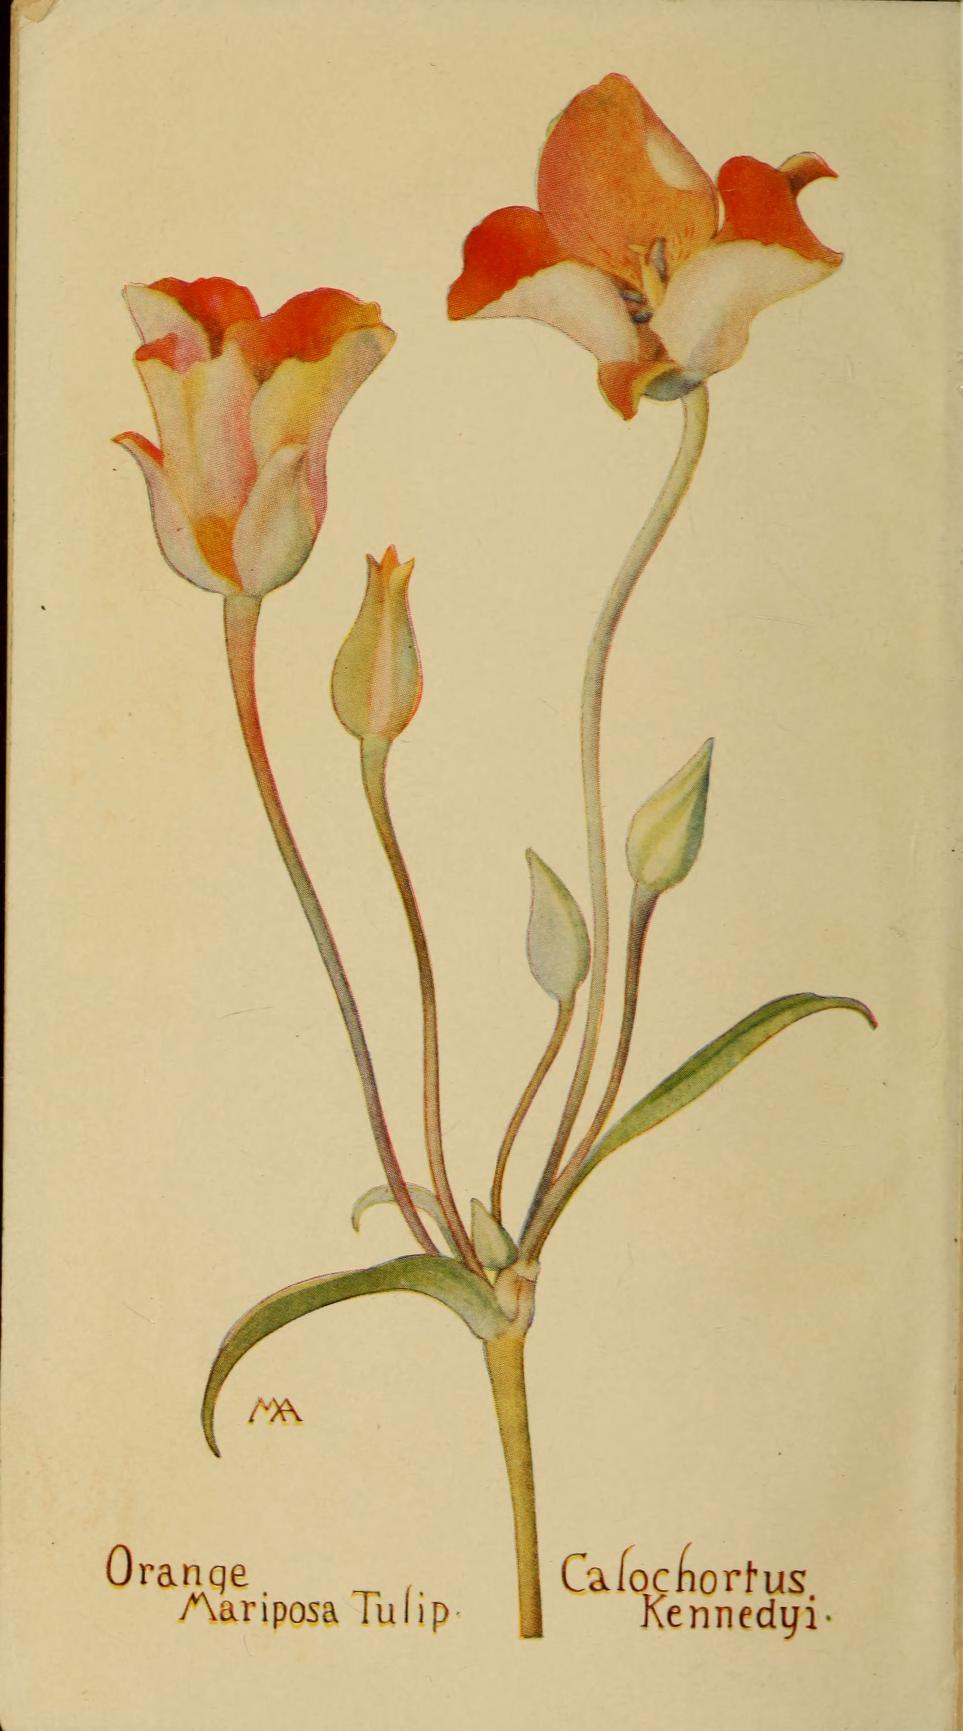 """Orange Mariposa Tulip"" (Calochortis Kennedyi). Frontispiece."